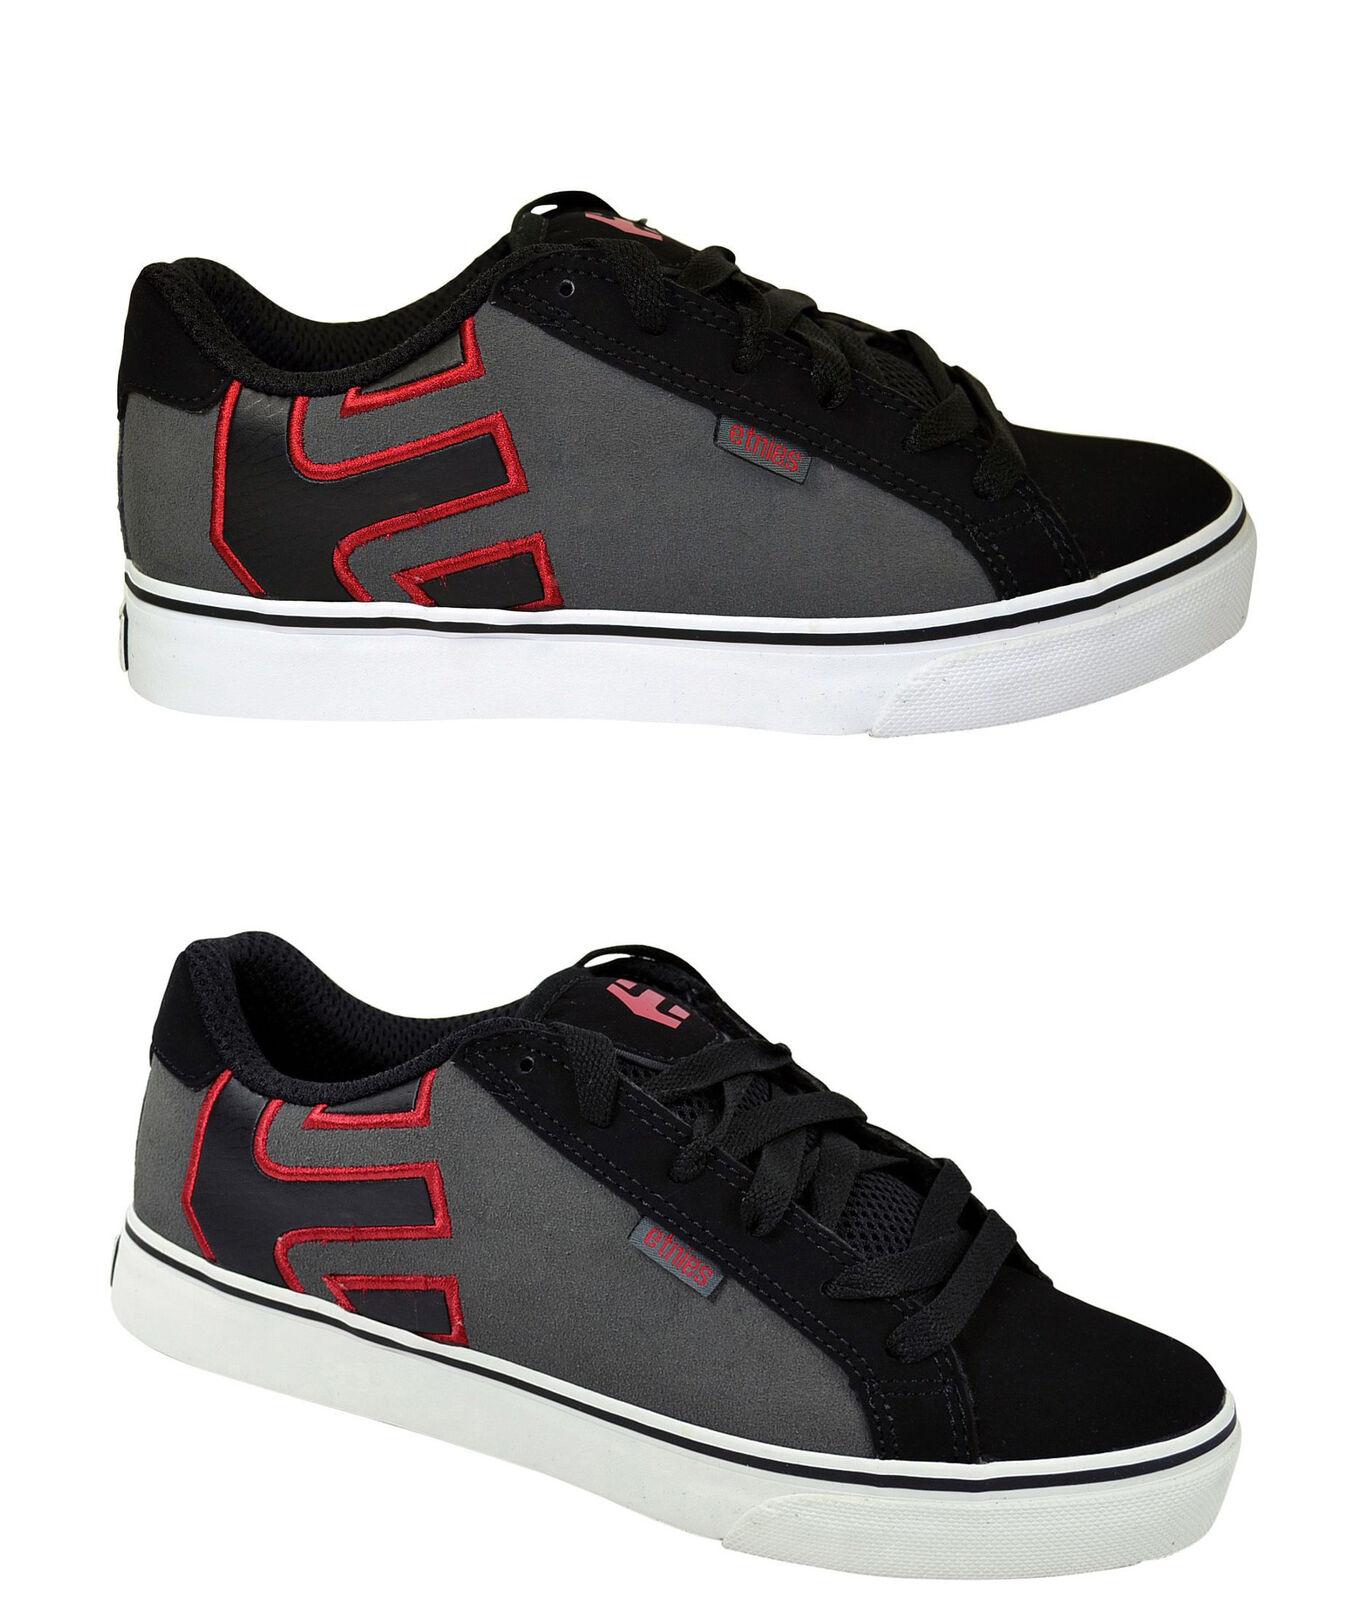 Etnies Fader Vulc black/grey/red Größenauswahl! Schuhe/Sneaker Größenauswahl! black/grey/red schwarz 1cf5de